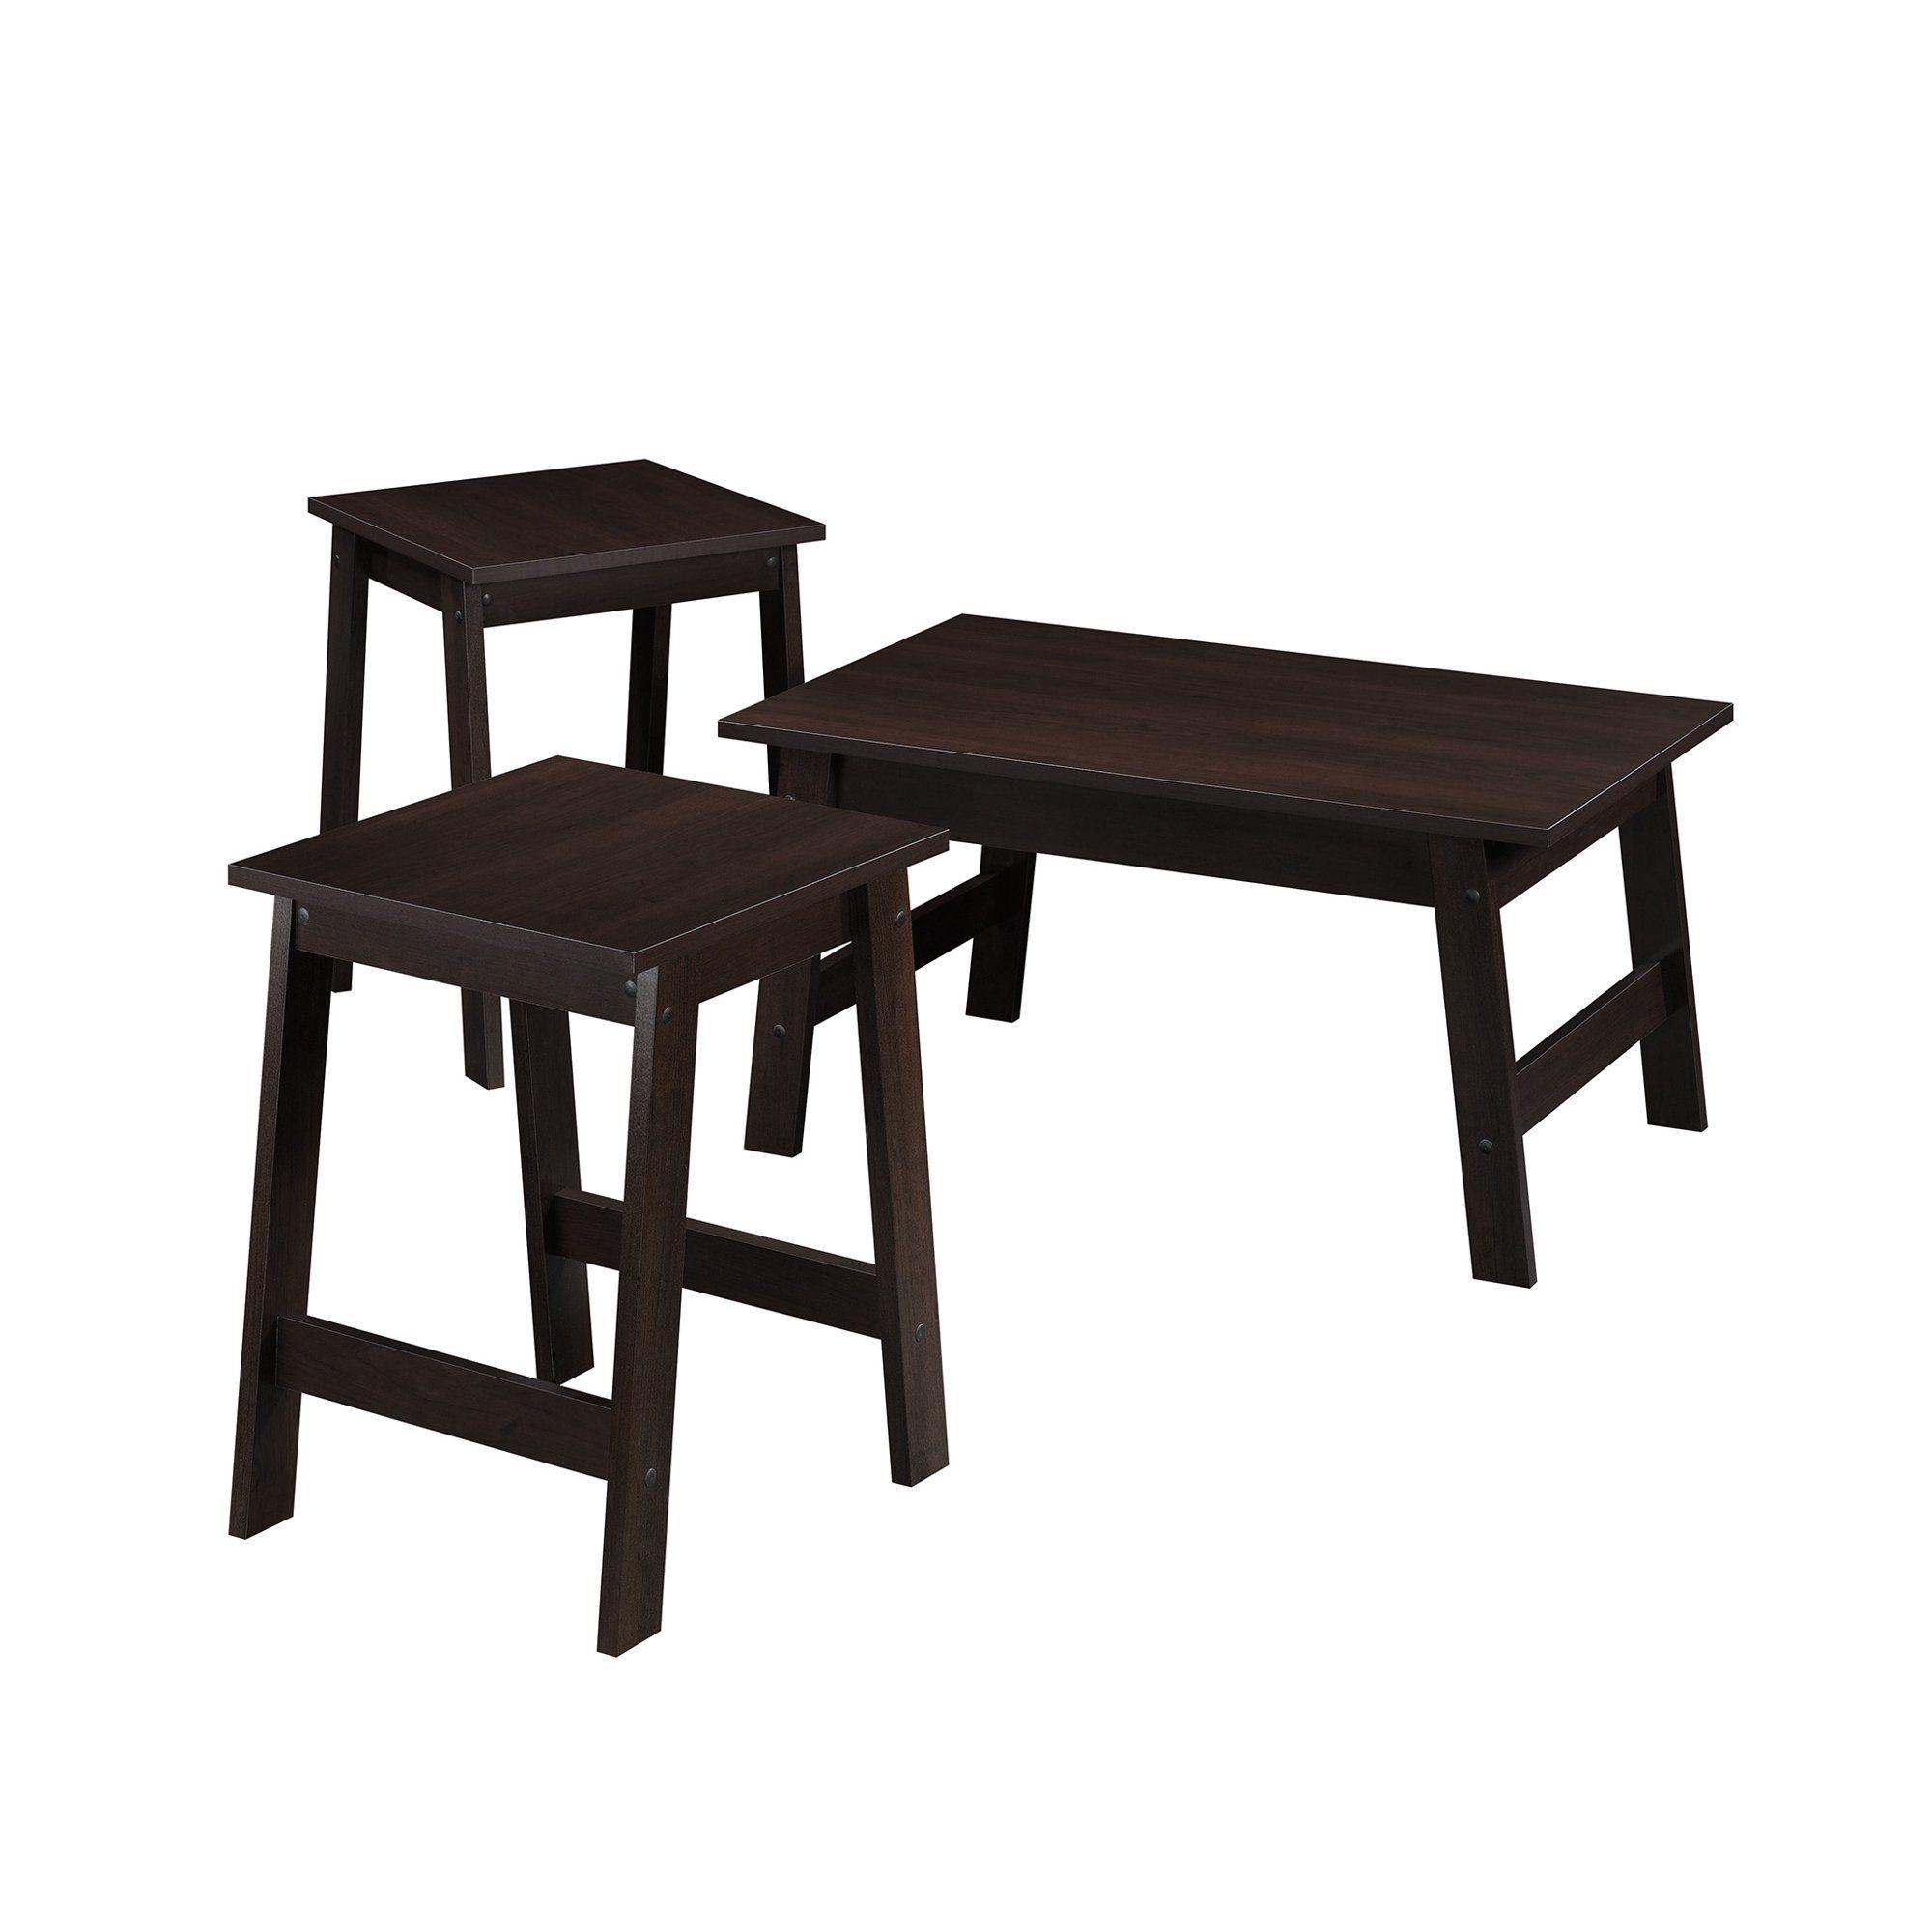 Mainstays Pilson 3 Piece Coffee Table And End Table Set Espresso Finish Walmart Com Walmart Com End Table Sets Coffee Table End Tables [ 2000 x 2000 Pixel ]